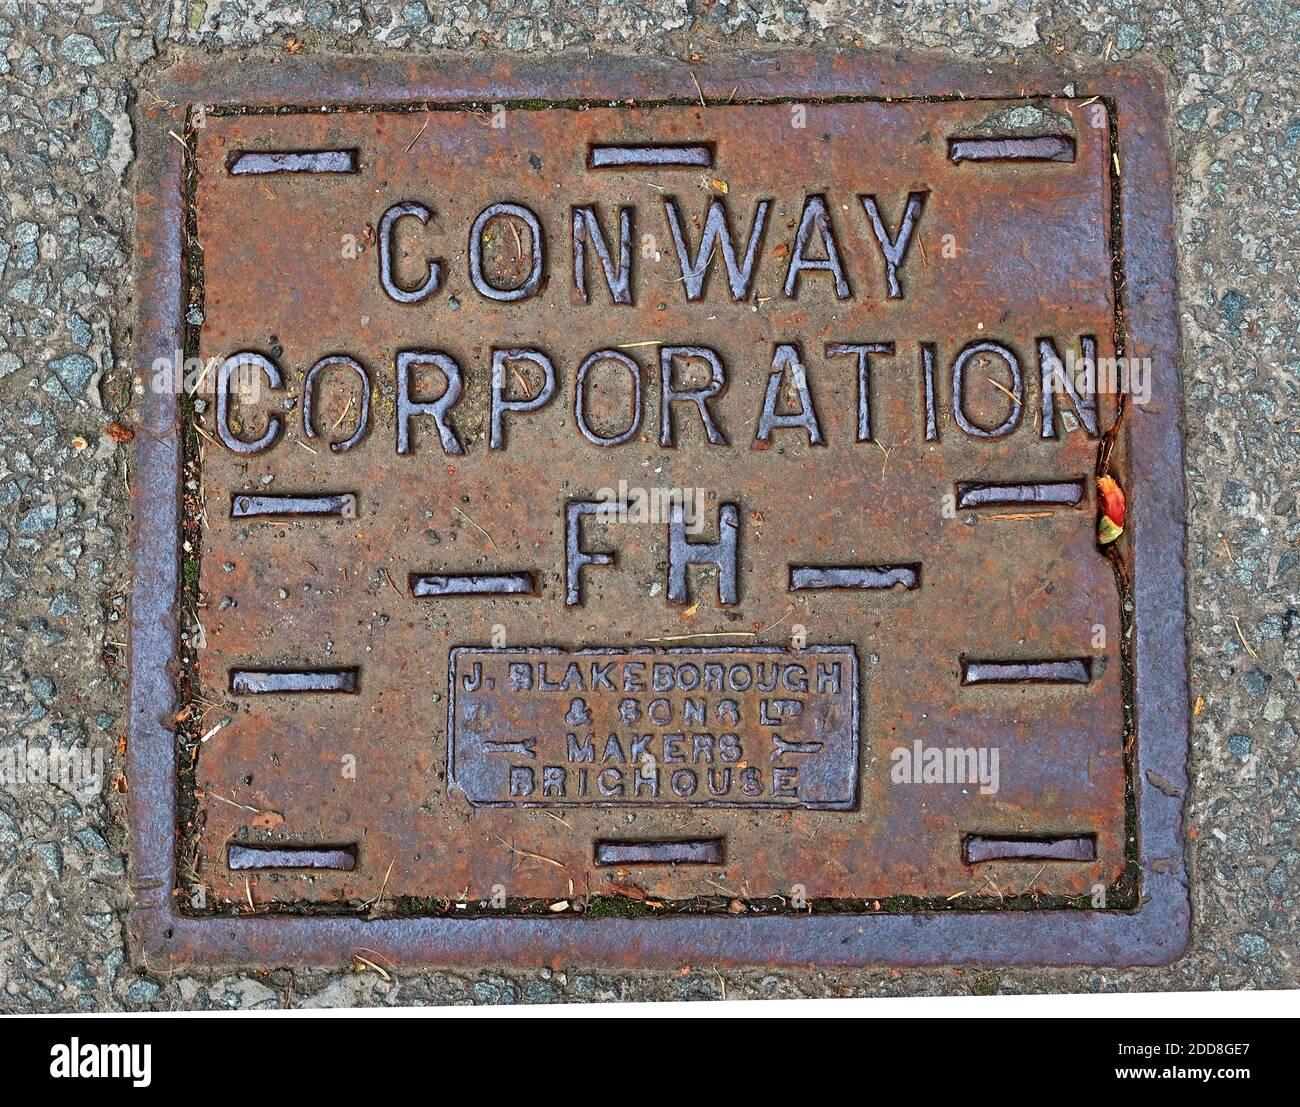 Dieses Stockfoto: Conway Corporation FH, Conwy Corporation FH, Hydrantenabdeckung, Eisenwerk, Blakeborough, Makerinnen Brighouse - 2DD8GE